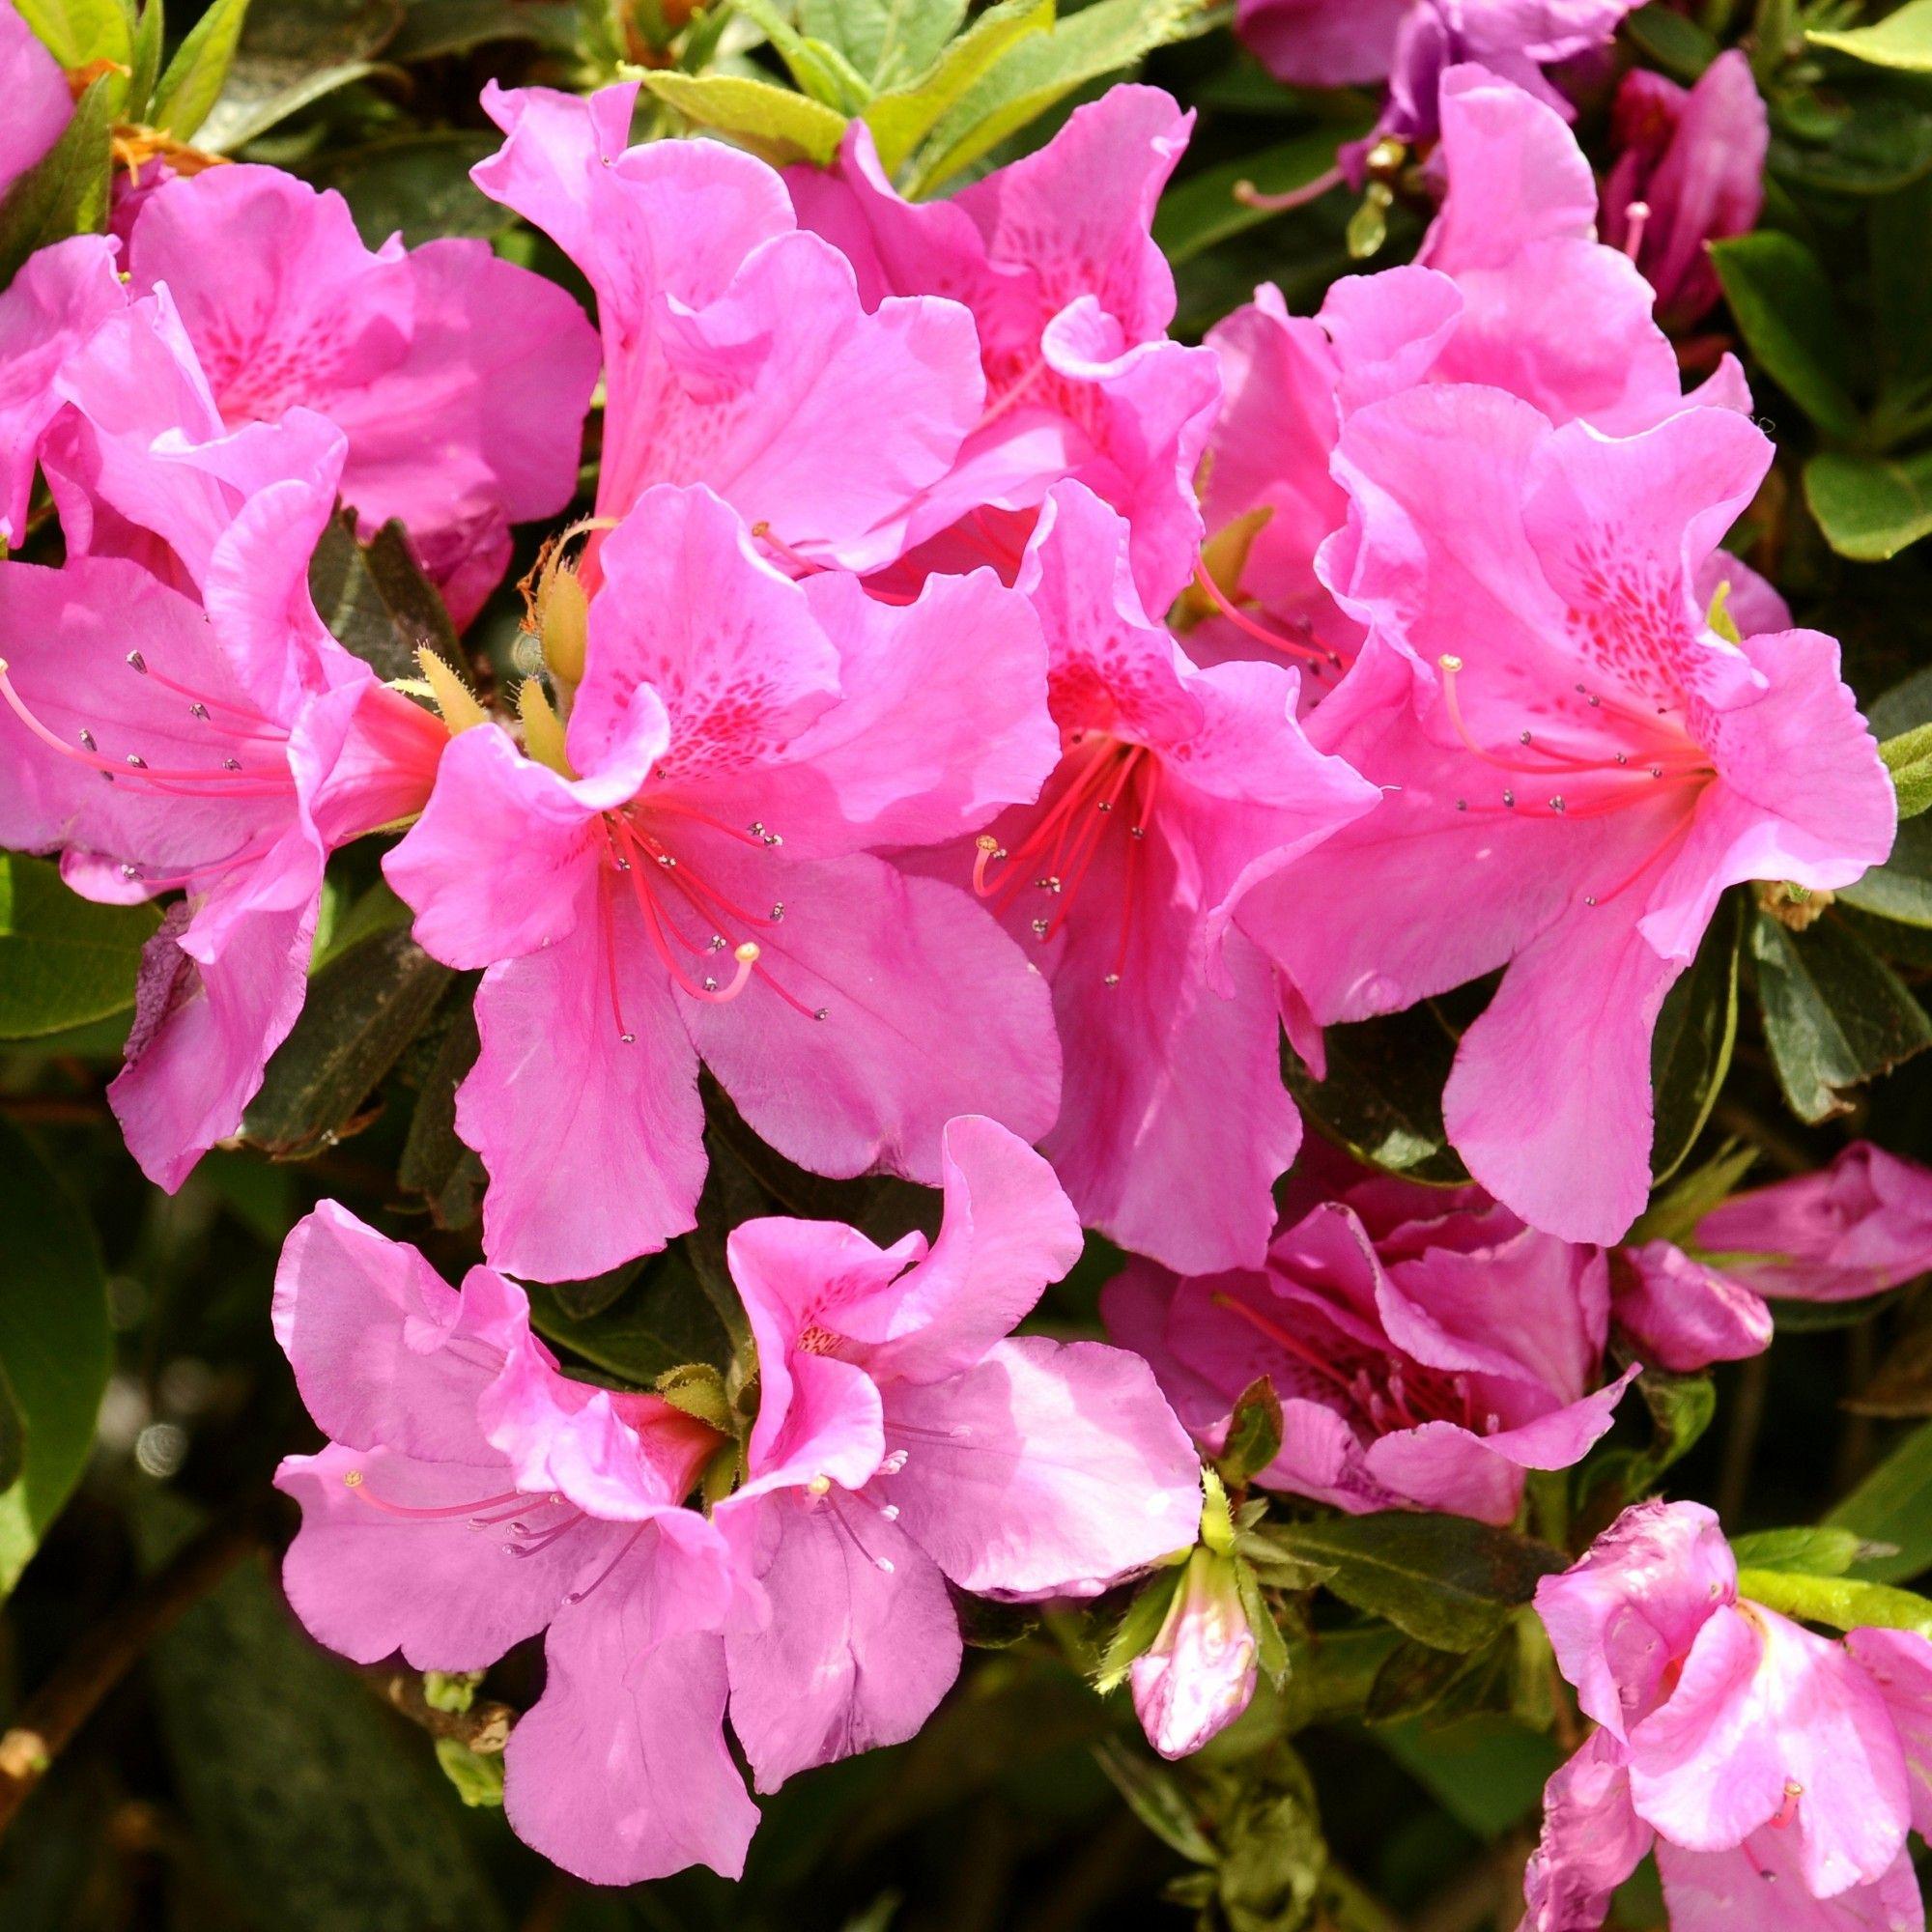 Azalea Pride Of Mobile 2 5qt U S D A Hardiness Zones 7 10 1pc National Plant Network Beautiful Flowers Wallpapers Beautiful Flowers Pictures Azaleas